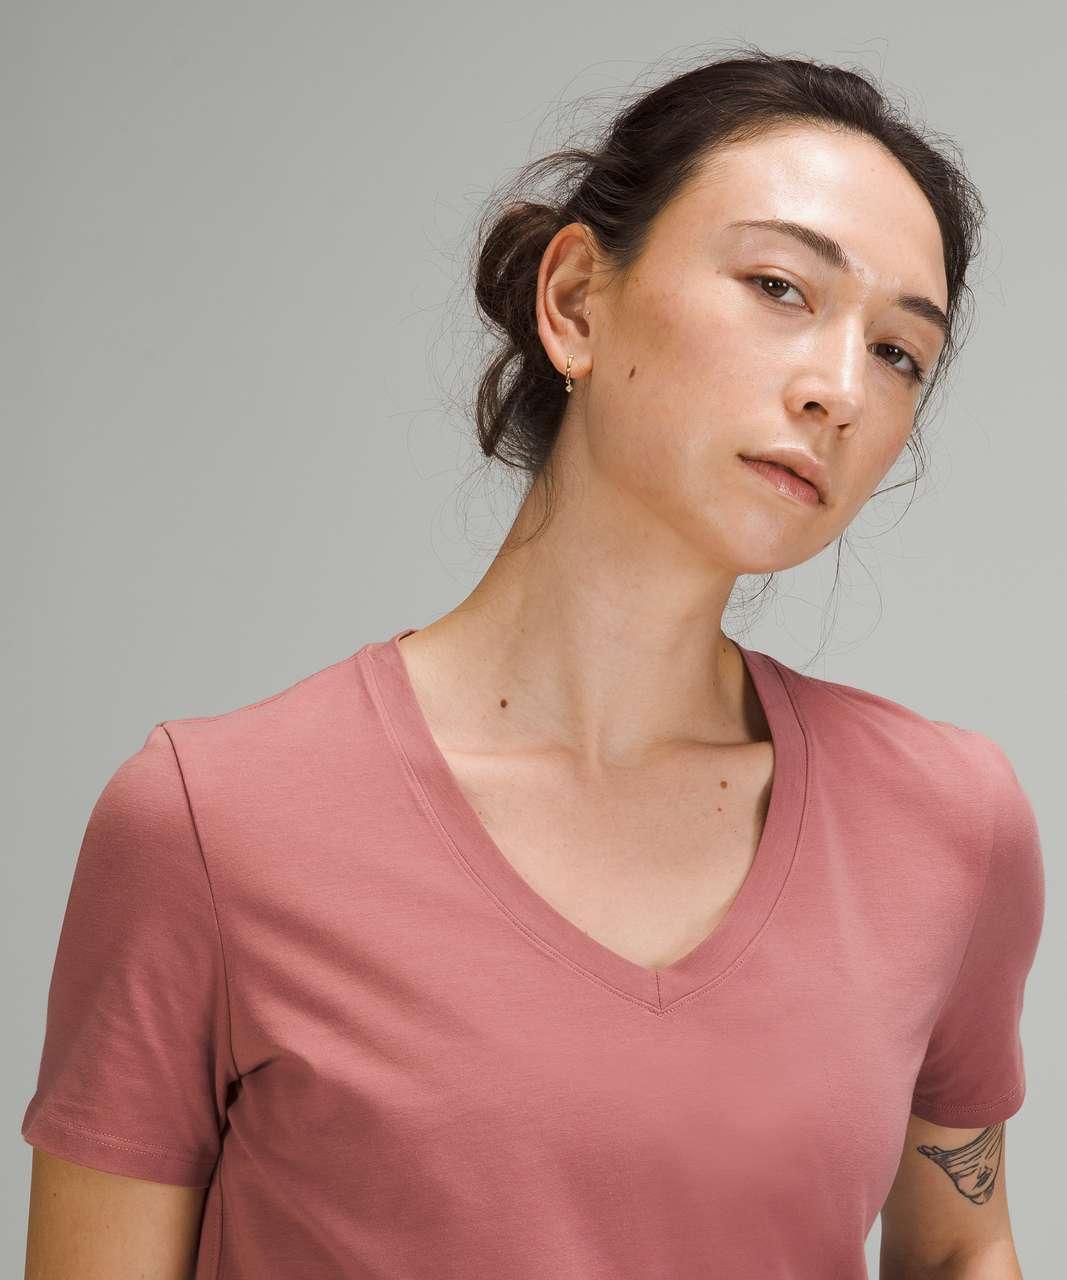 Lululemon Love Tee Short Sleeve V-Neck T-Shirt - Spiced Chai